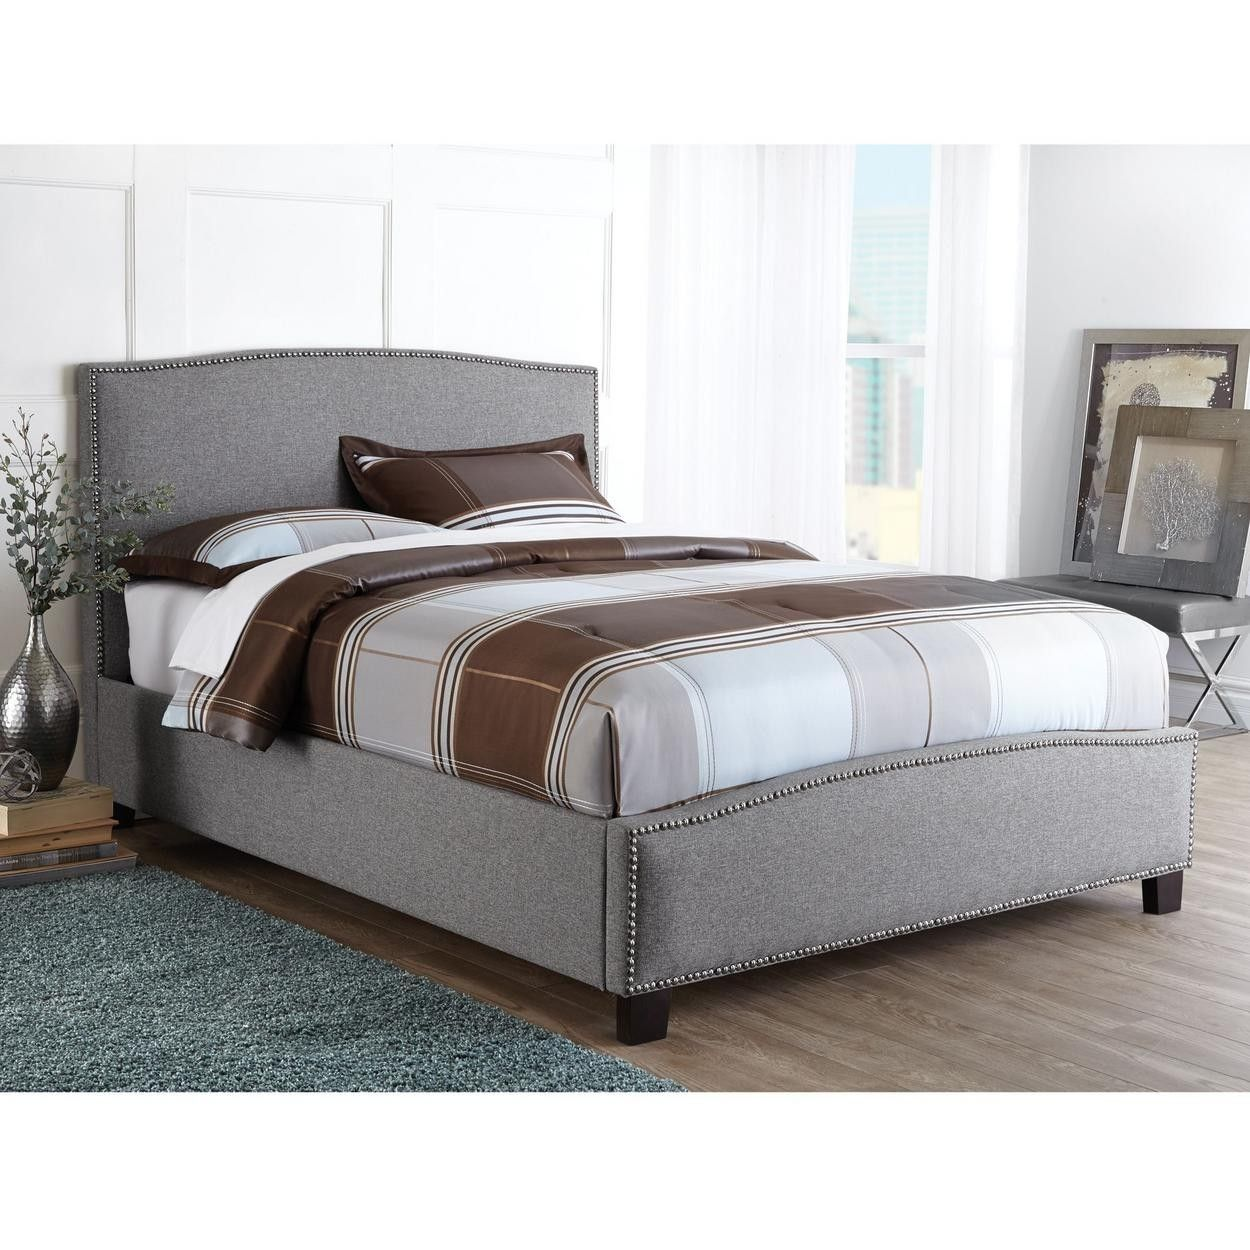 Sears Bedroom Furniture Ideas For Choosing Perfect Sears Bedroom